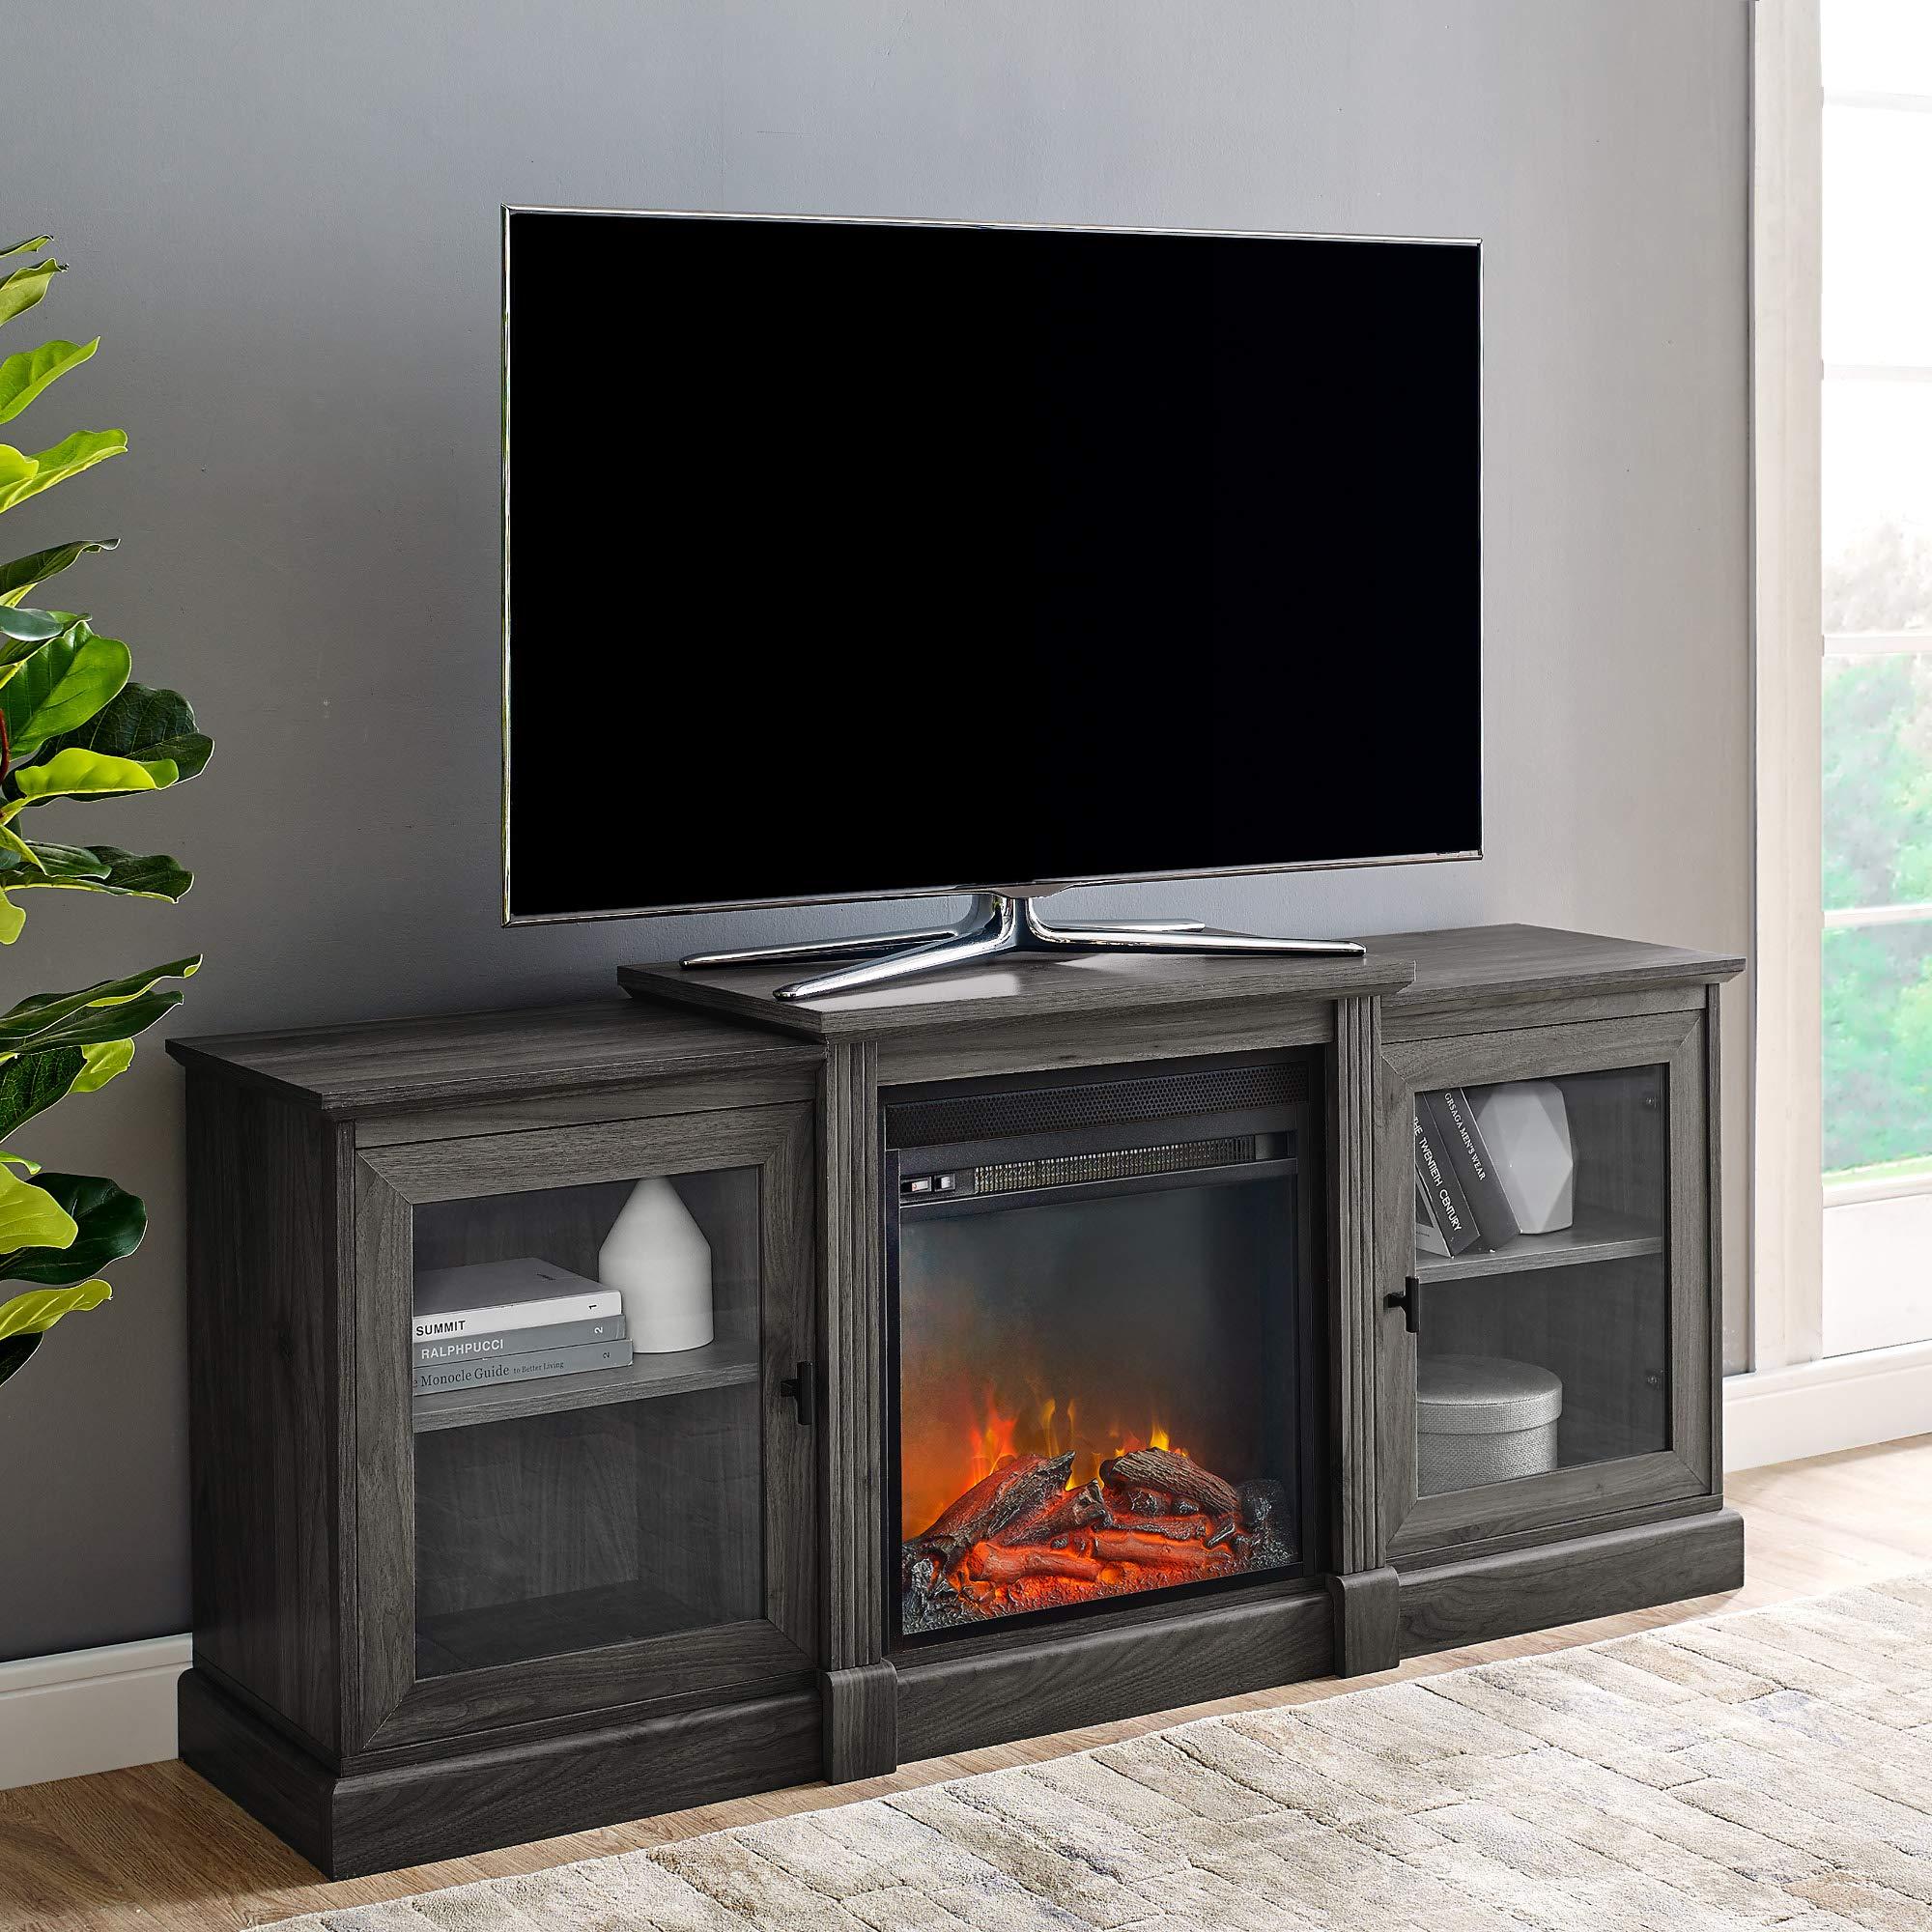 Walker Edison Furniture Company Flat Screen Universal TV Console Living Room Storage Shelves Entertainment Center, Slate Grey, 60 Inch